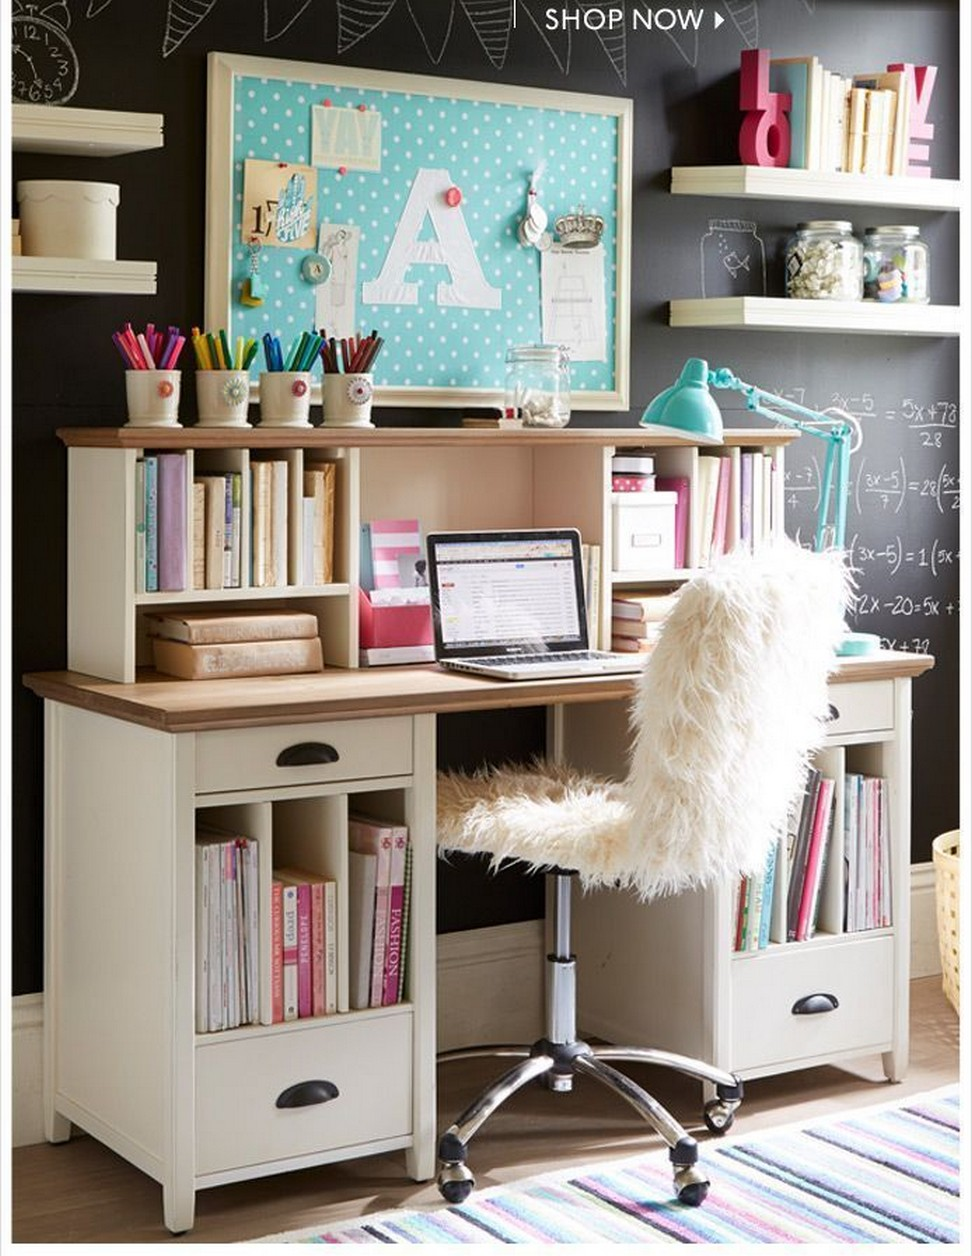 Topnotch Arrangement Concept of Study Room You Must Follow